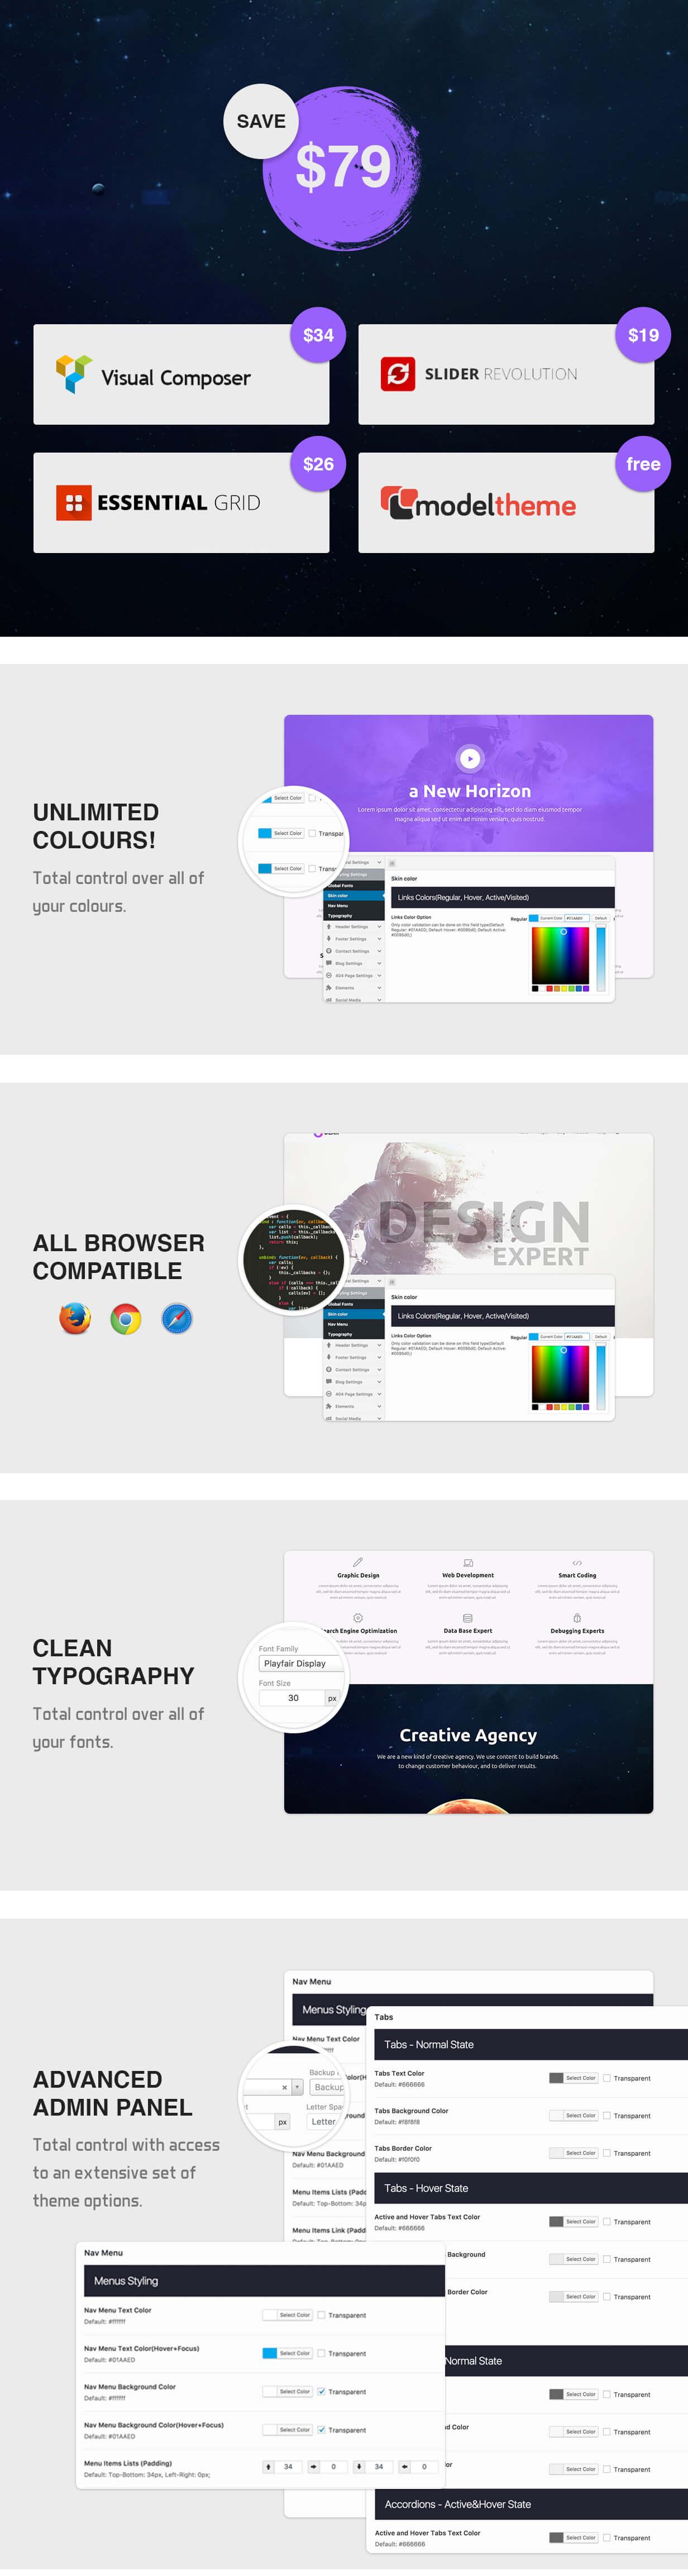 Odear - Multi-Concept Creative WordPress Theme - 3